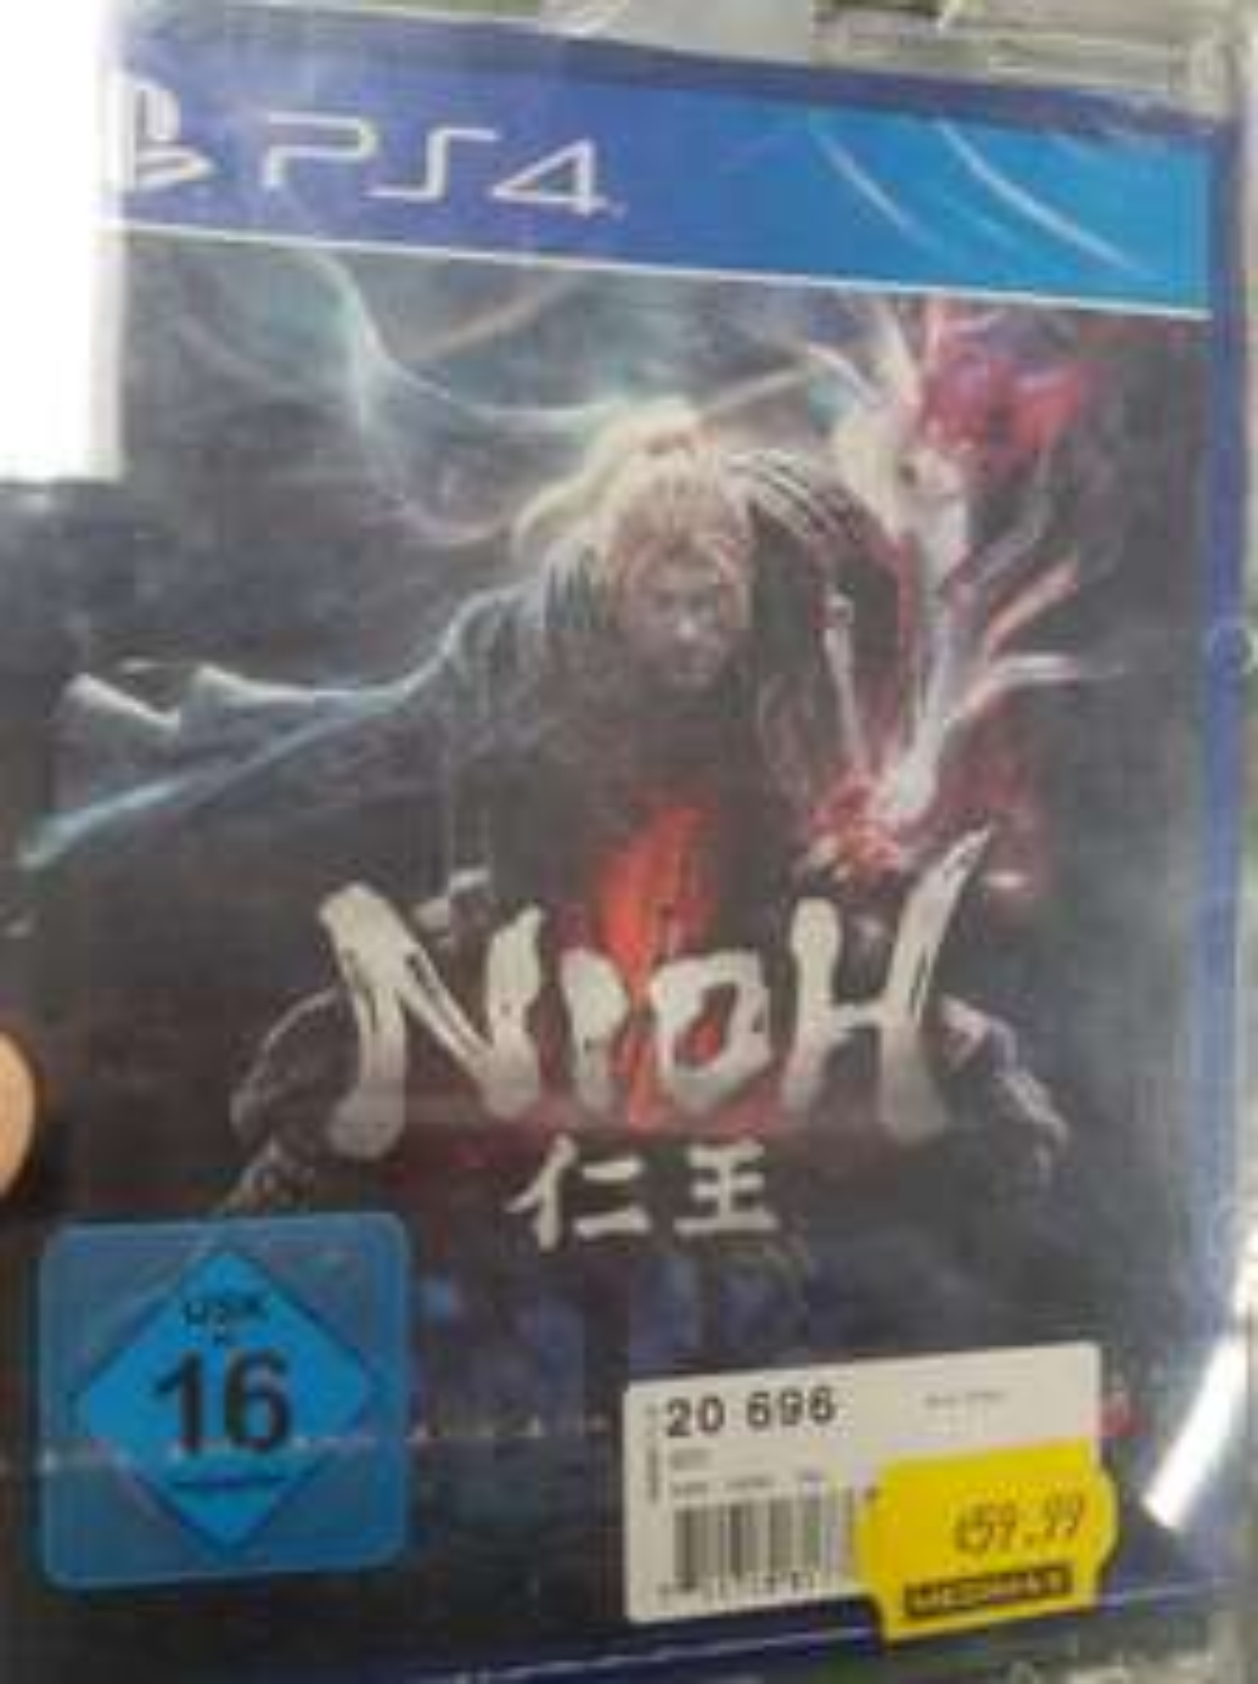 PS4 NIOH (Lokal MEDIMAX Mh a. d. Ruhr)